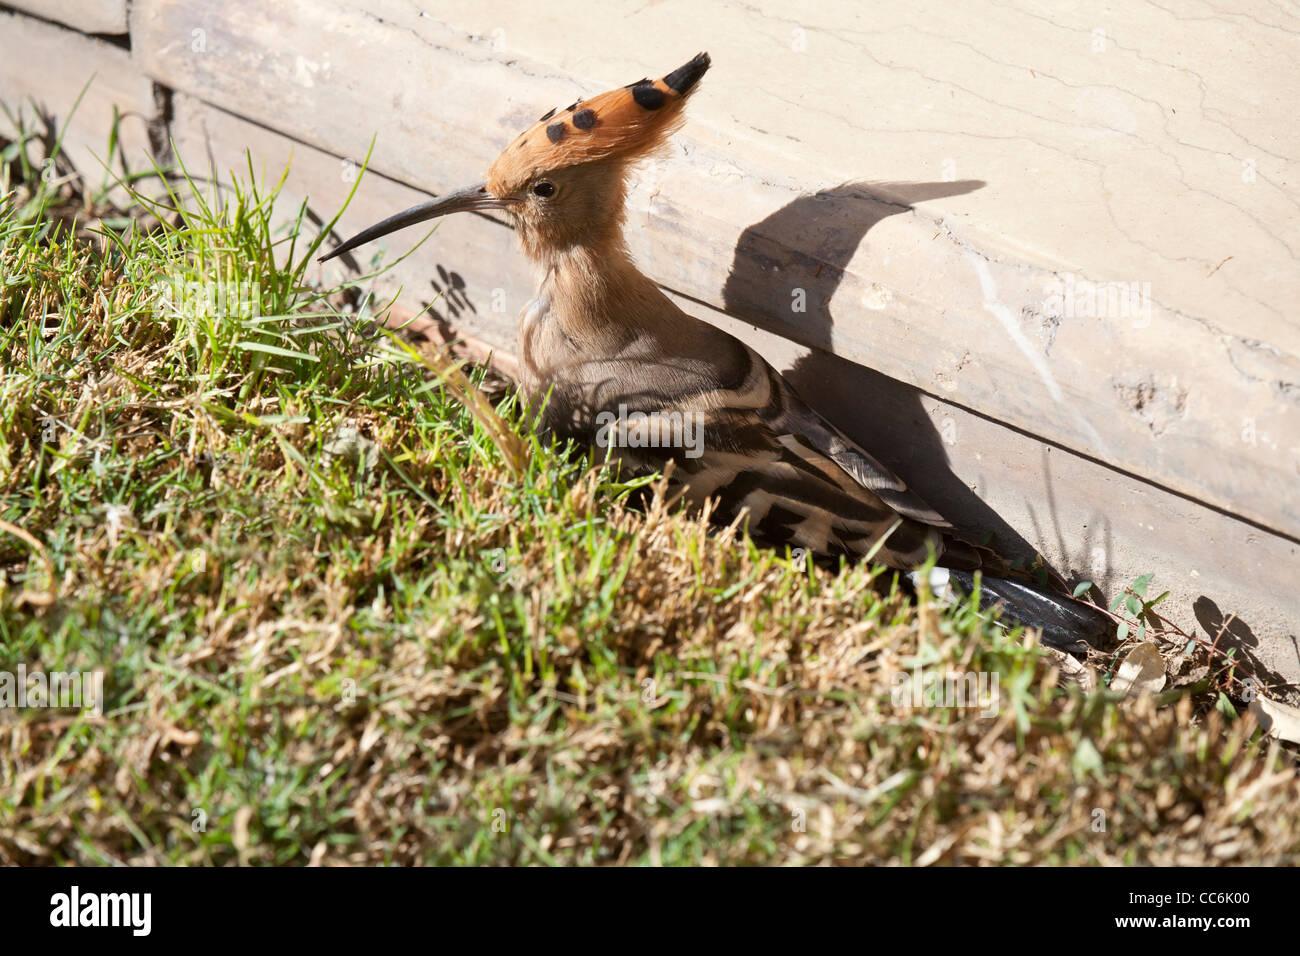 Hoopoe bird in the grass in Luxor Egypt Stock Photo